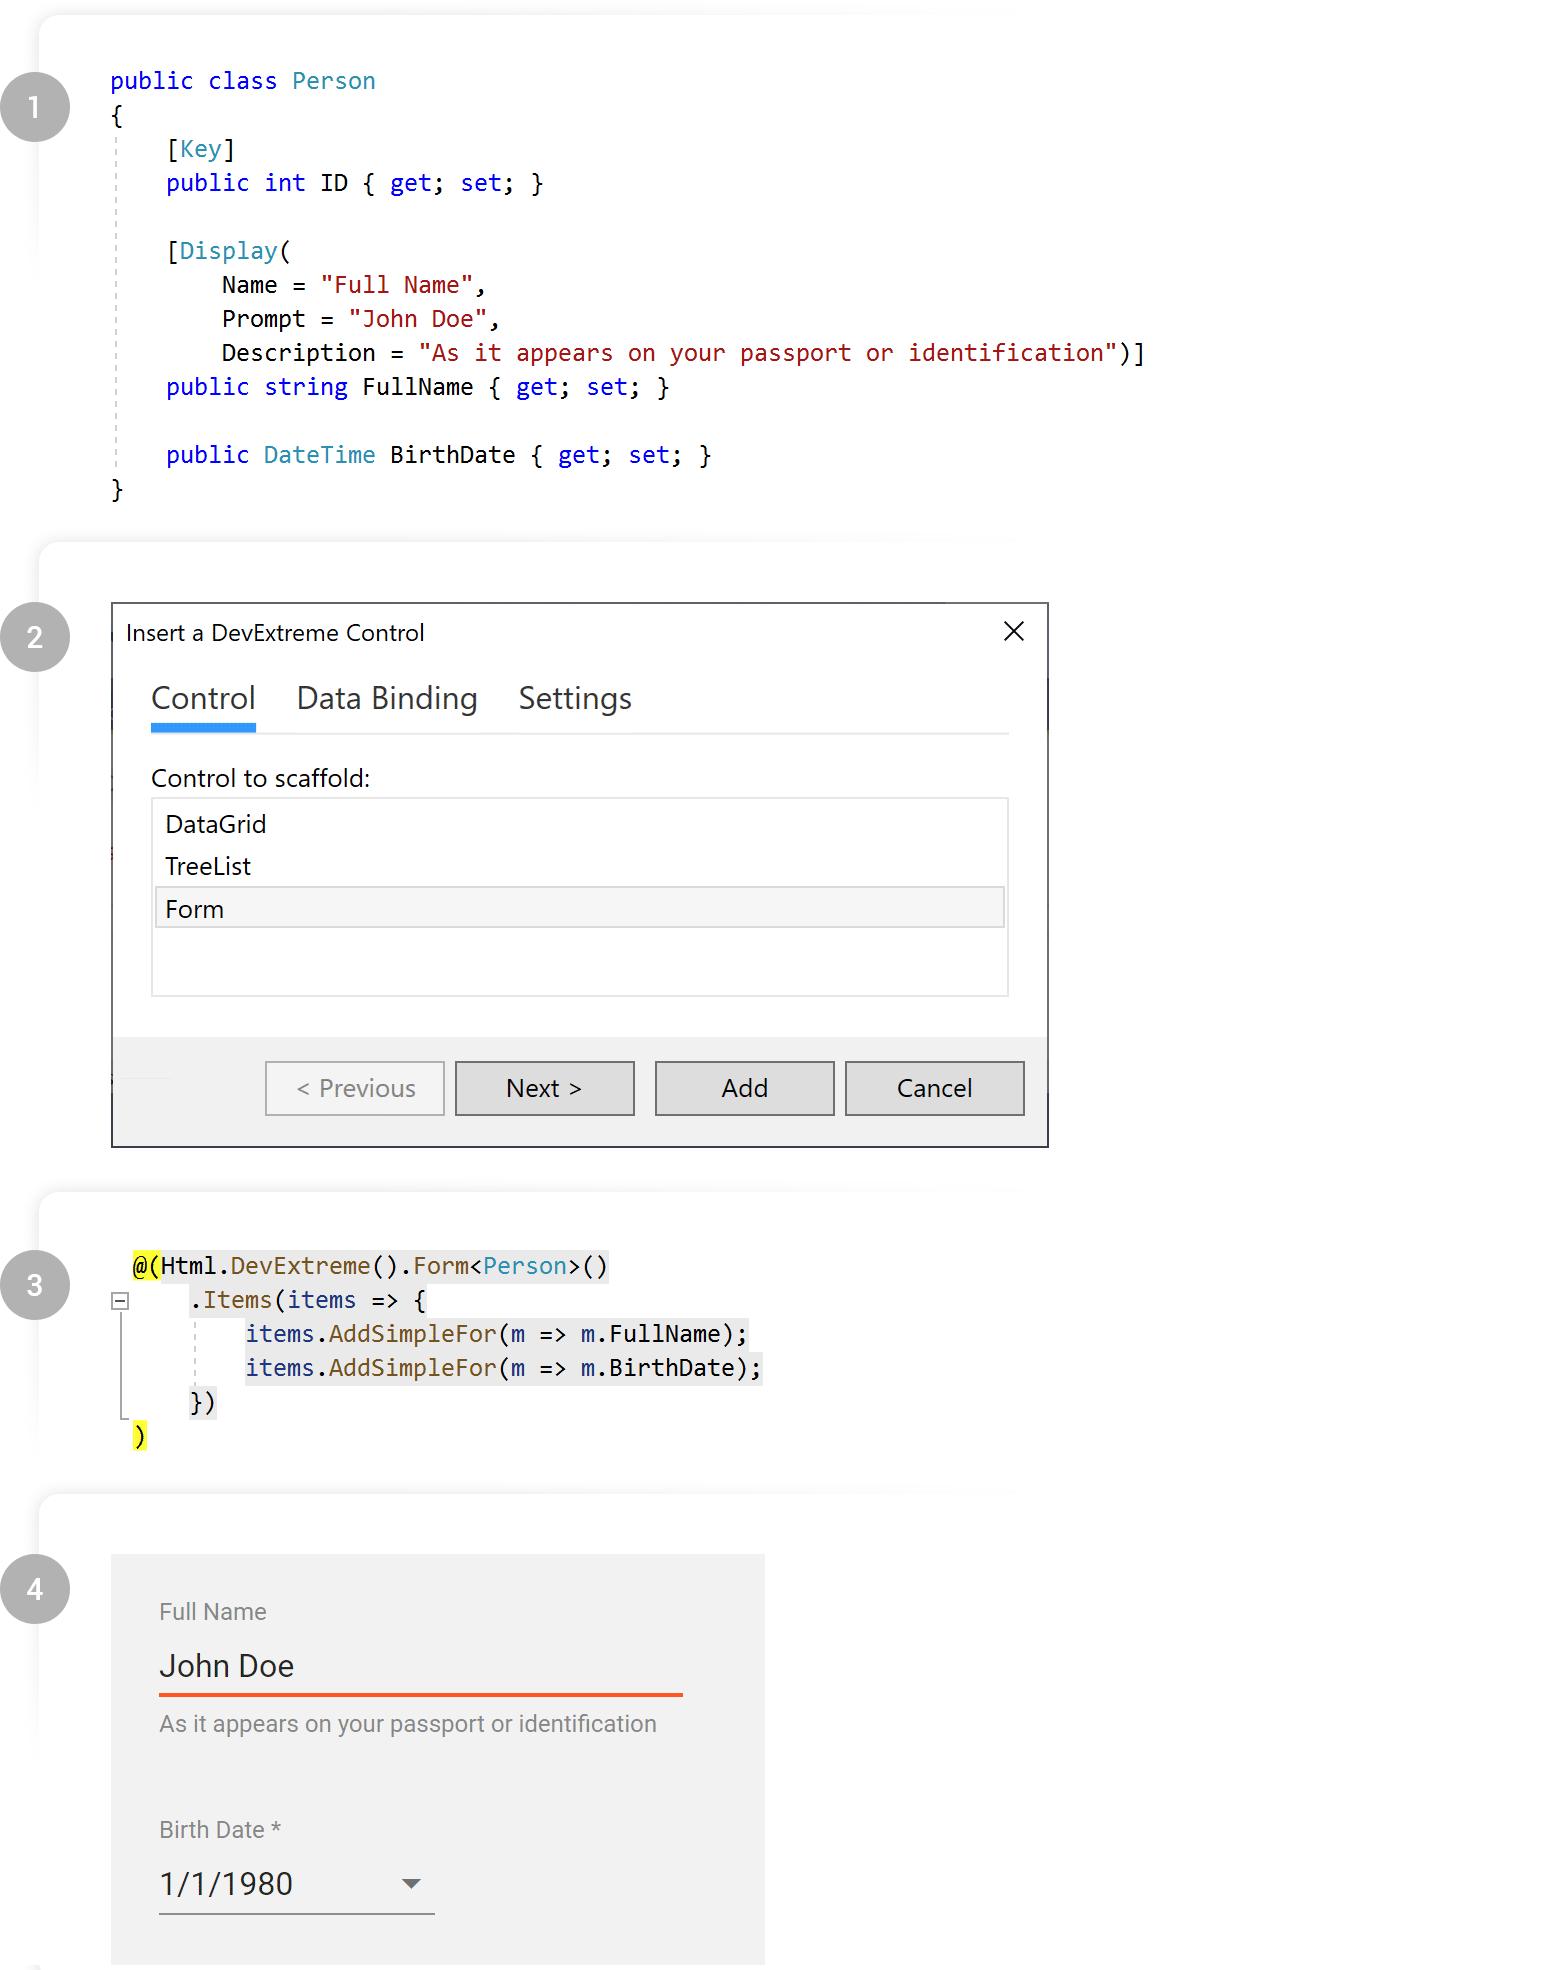 DevExtreme ASP.NET Form Wizard